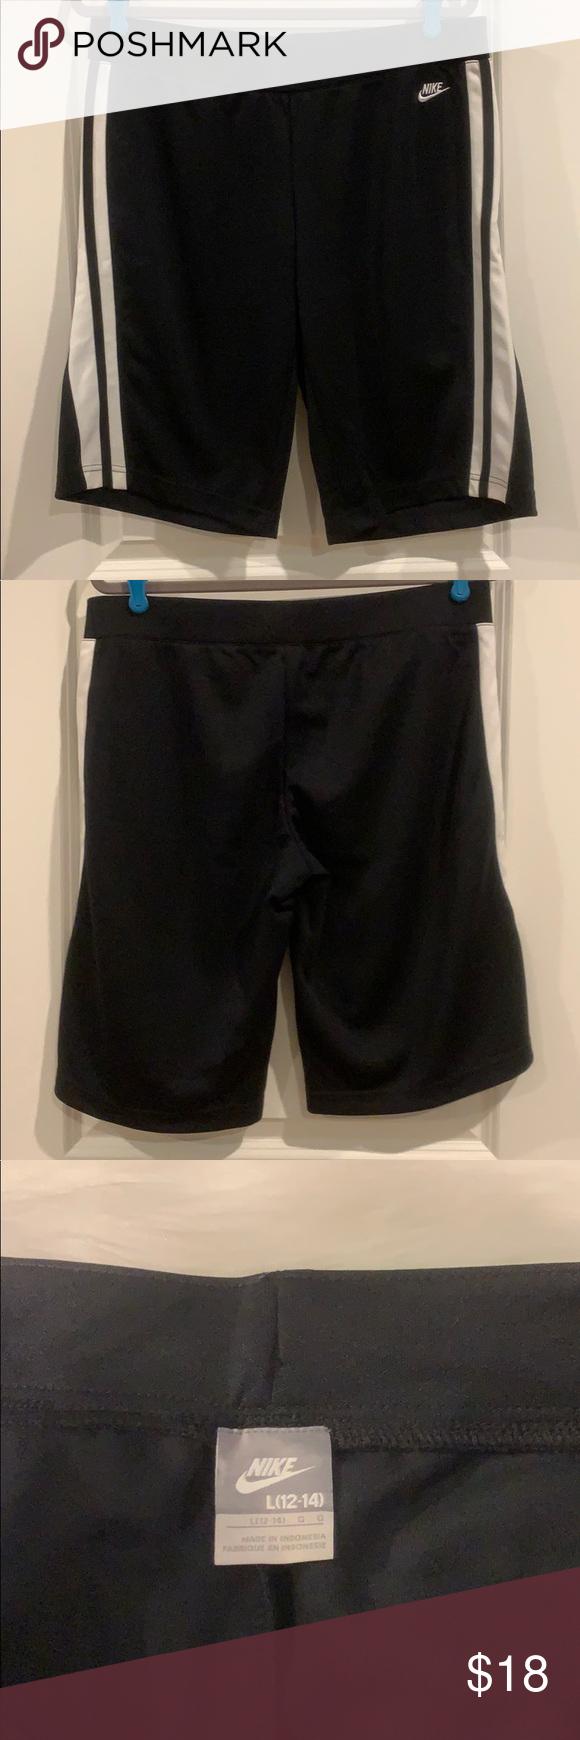 nike shorts 12 inch inseam